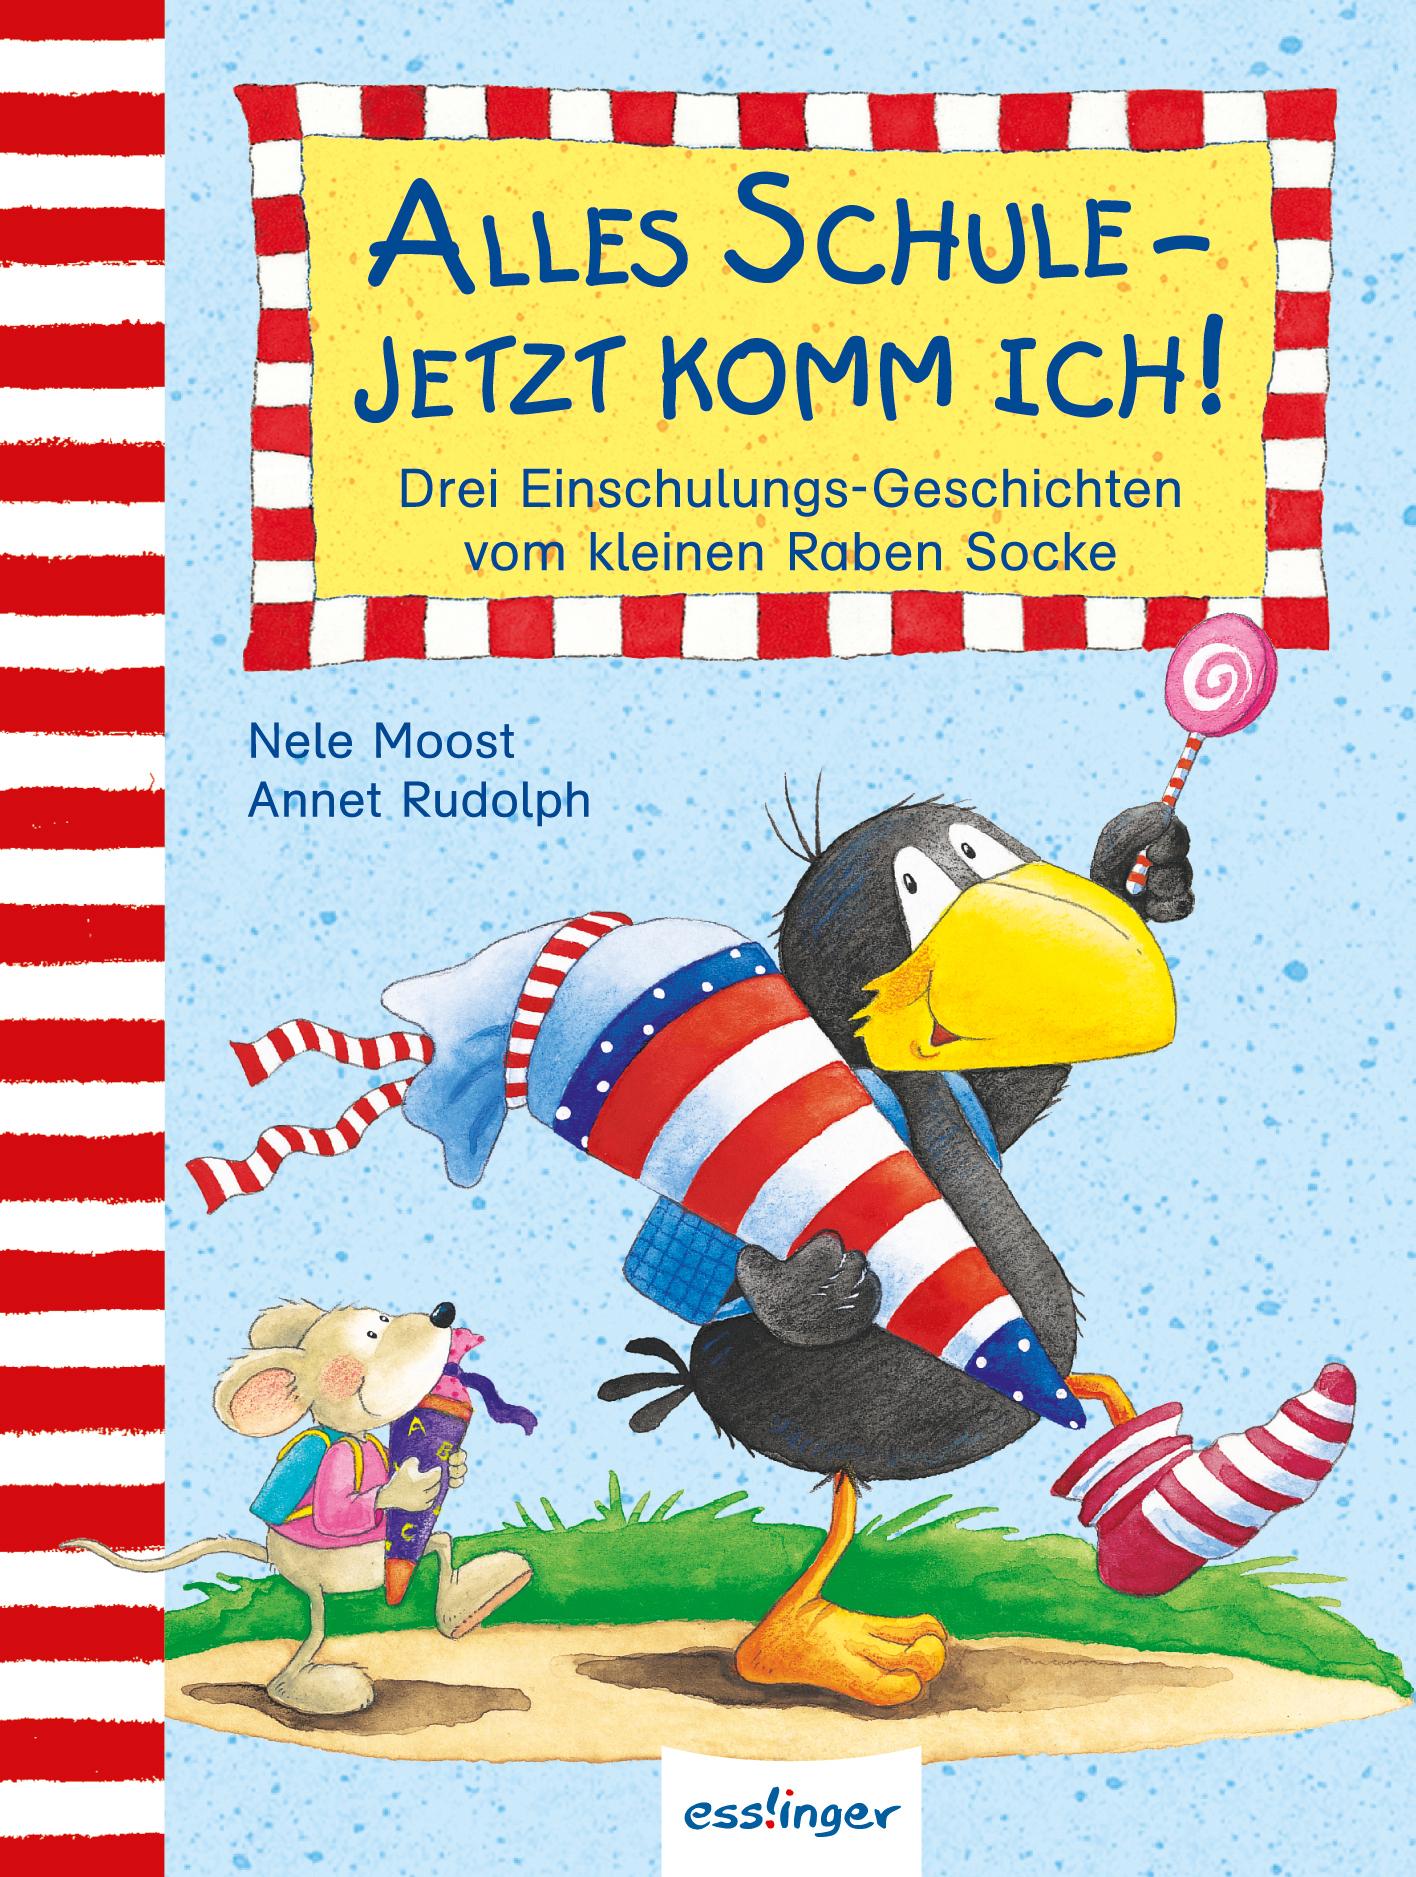 Kleiner Rabe Socke: Alles Schule - jetzt komm i...